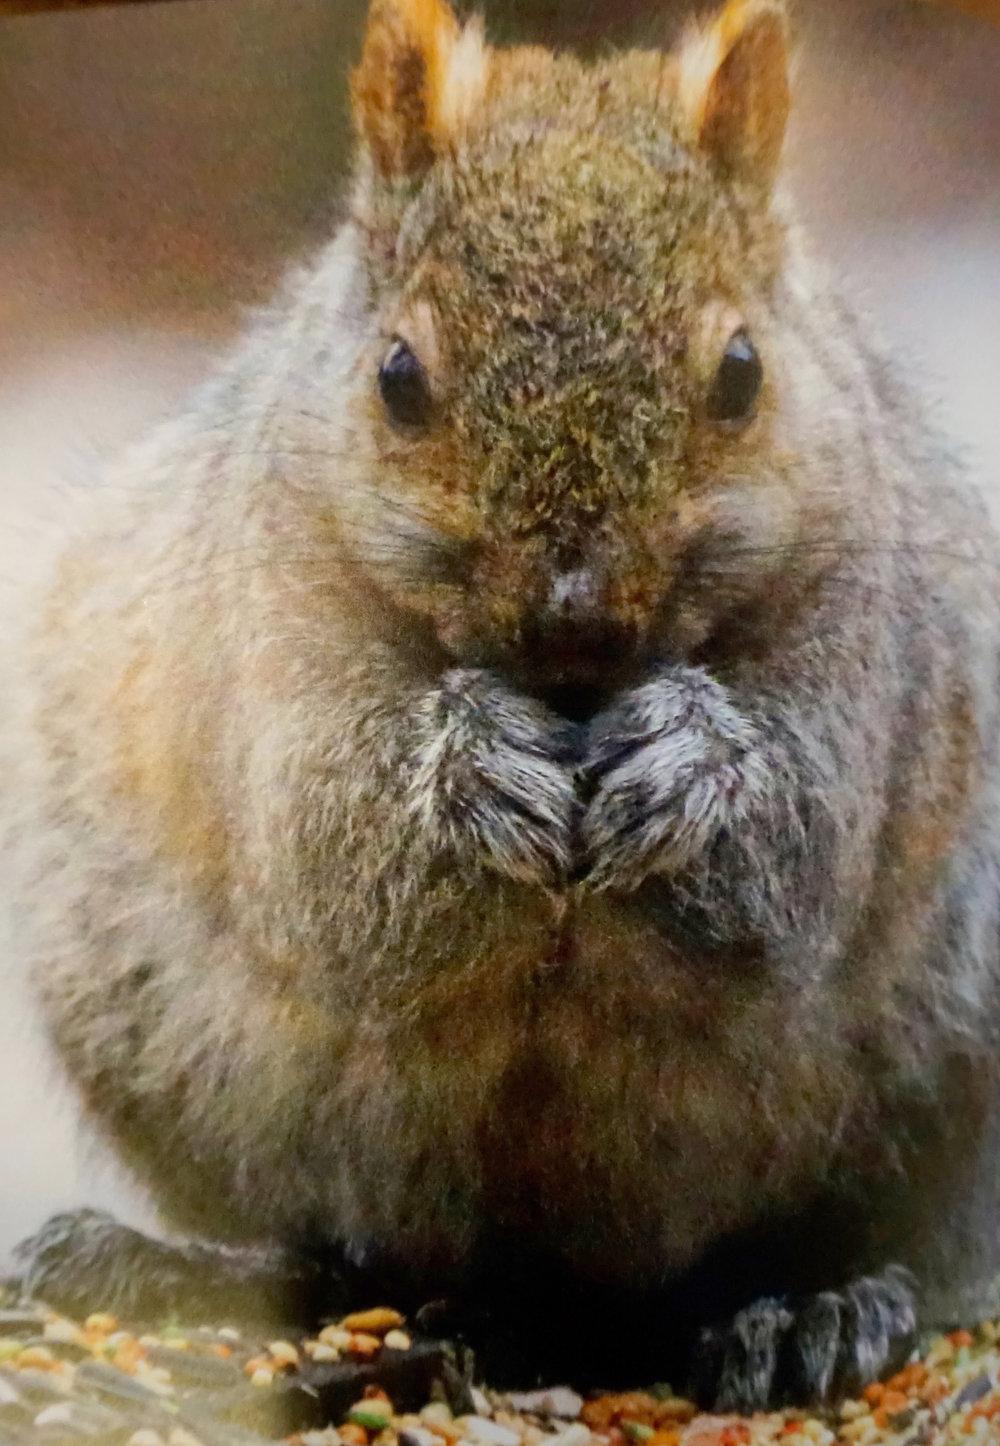 Wildlife abounds at Glenn Arbor and Rose Arbor